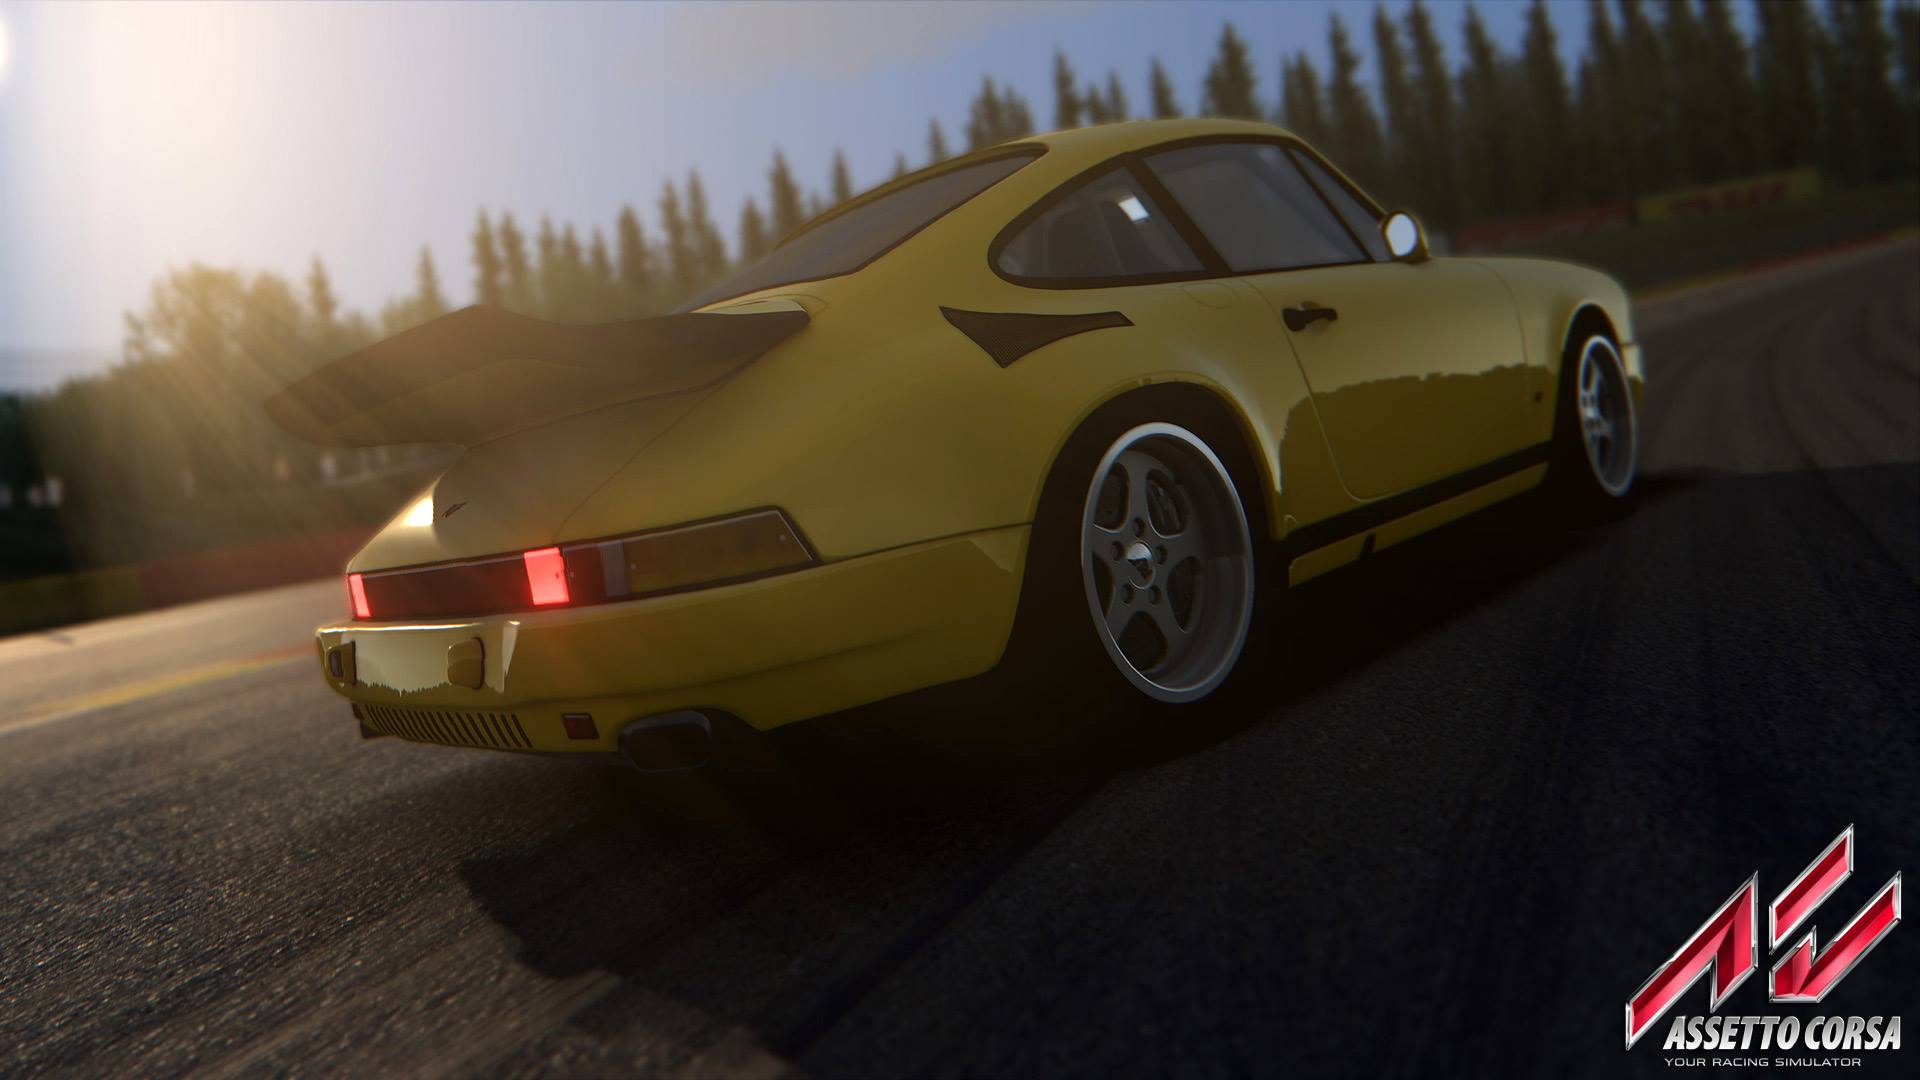 15885532088_7d91217bf6_o Exciting Fanatec Porsche 911 Gt2 Wheel Kaufen Cars Trend